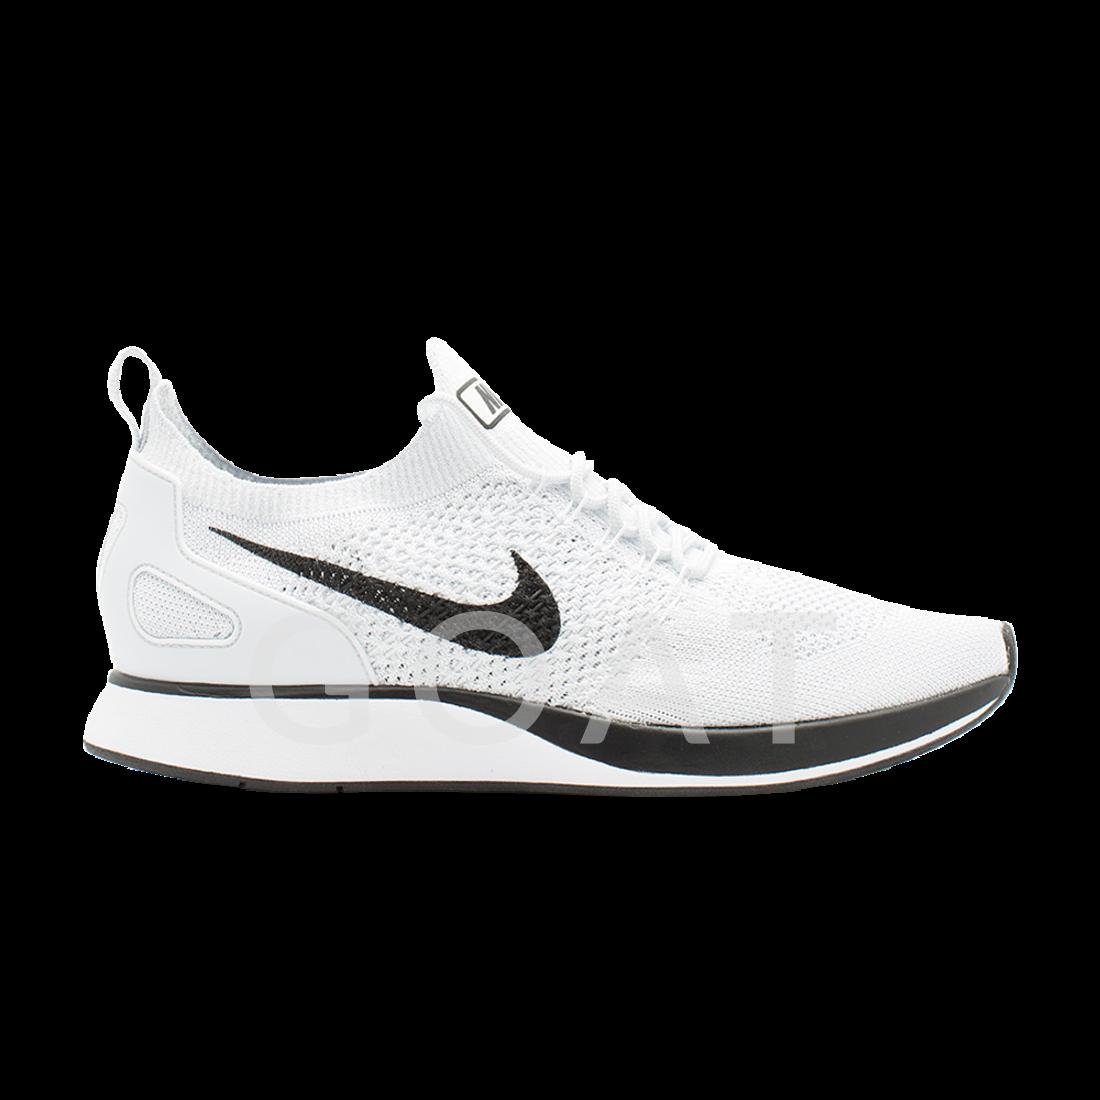 c2667541bab95 Air Zoom Mariah Flyknit Racer - Nike - 918264 002 - pure platinum white